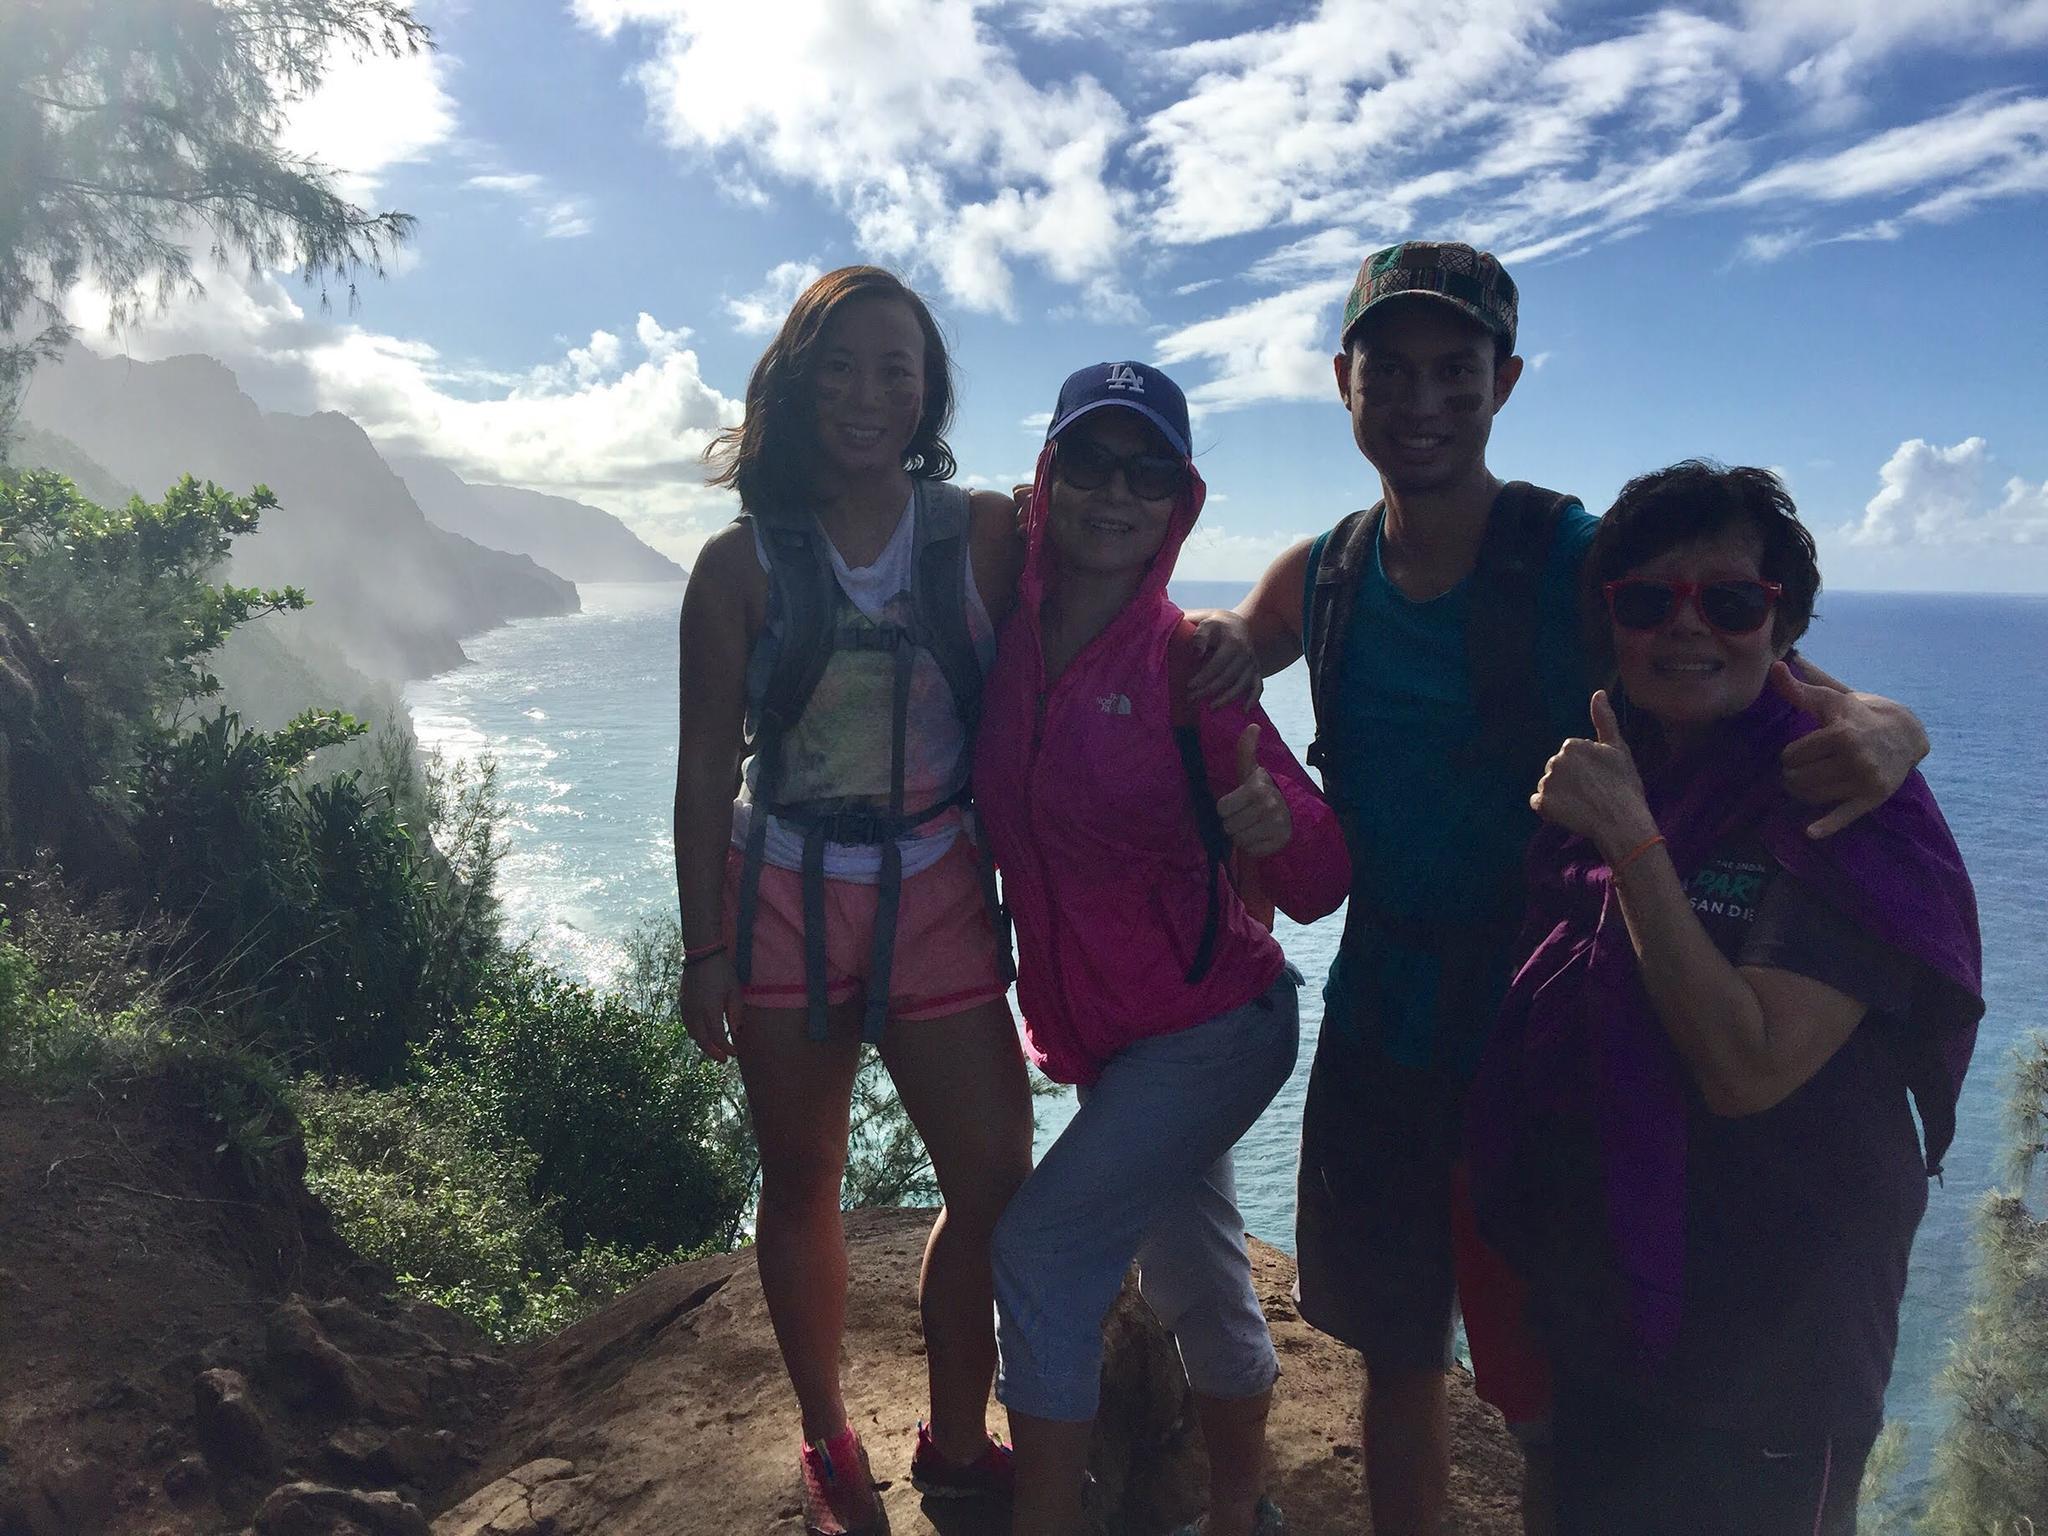 Hiking in Kauai, December 2017